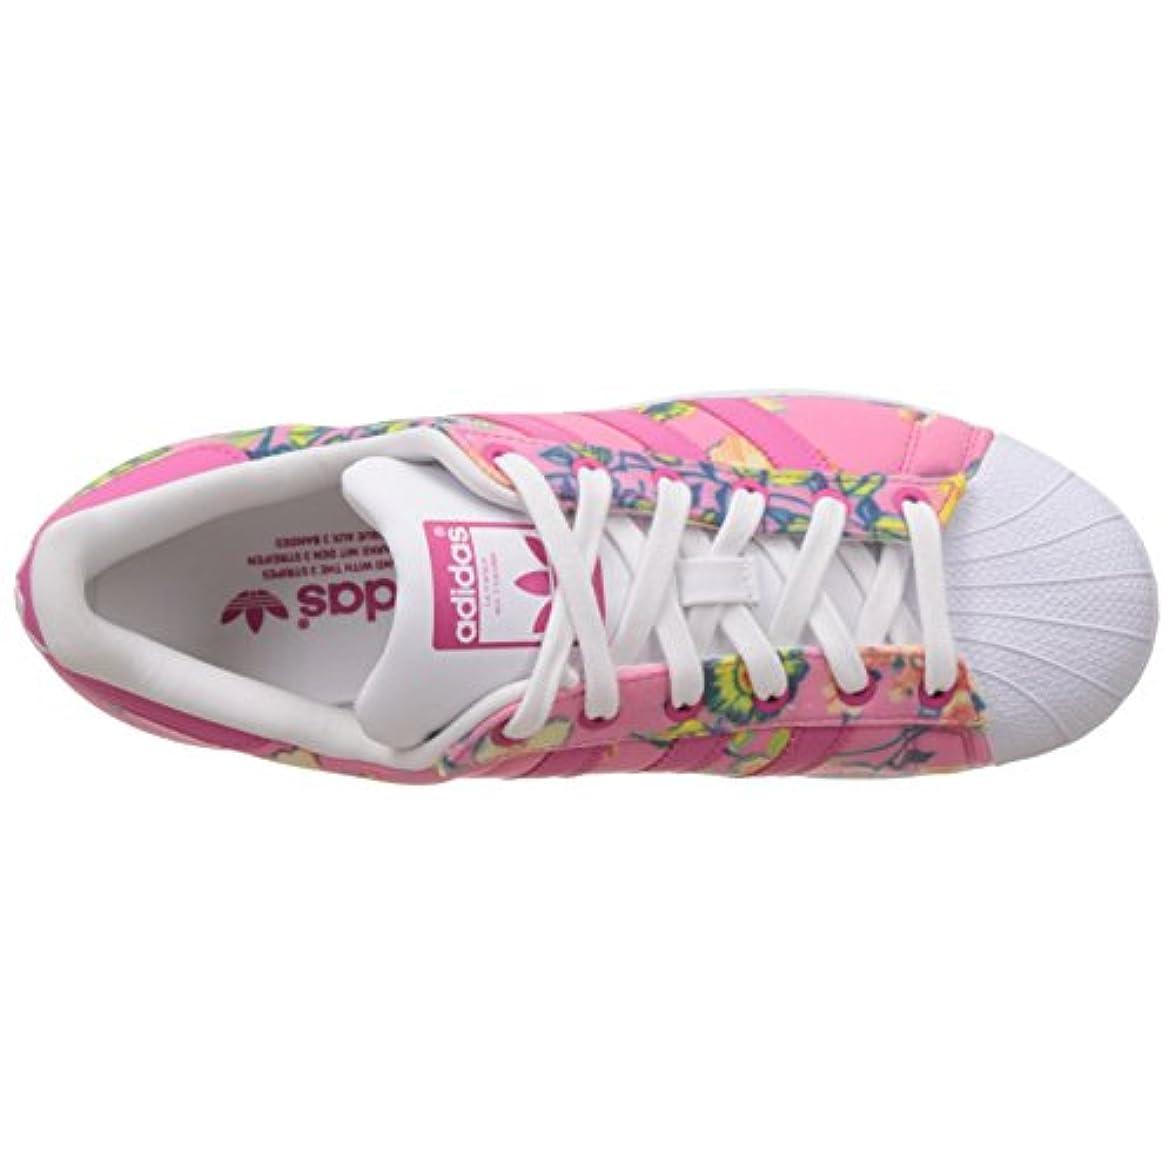 Donna Adidas Scarpe Low-top W Superstar